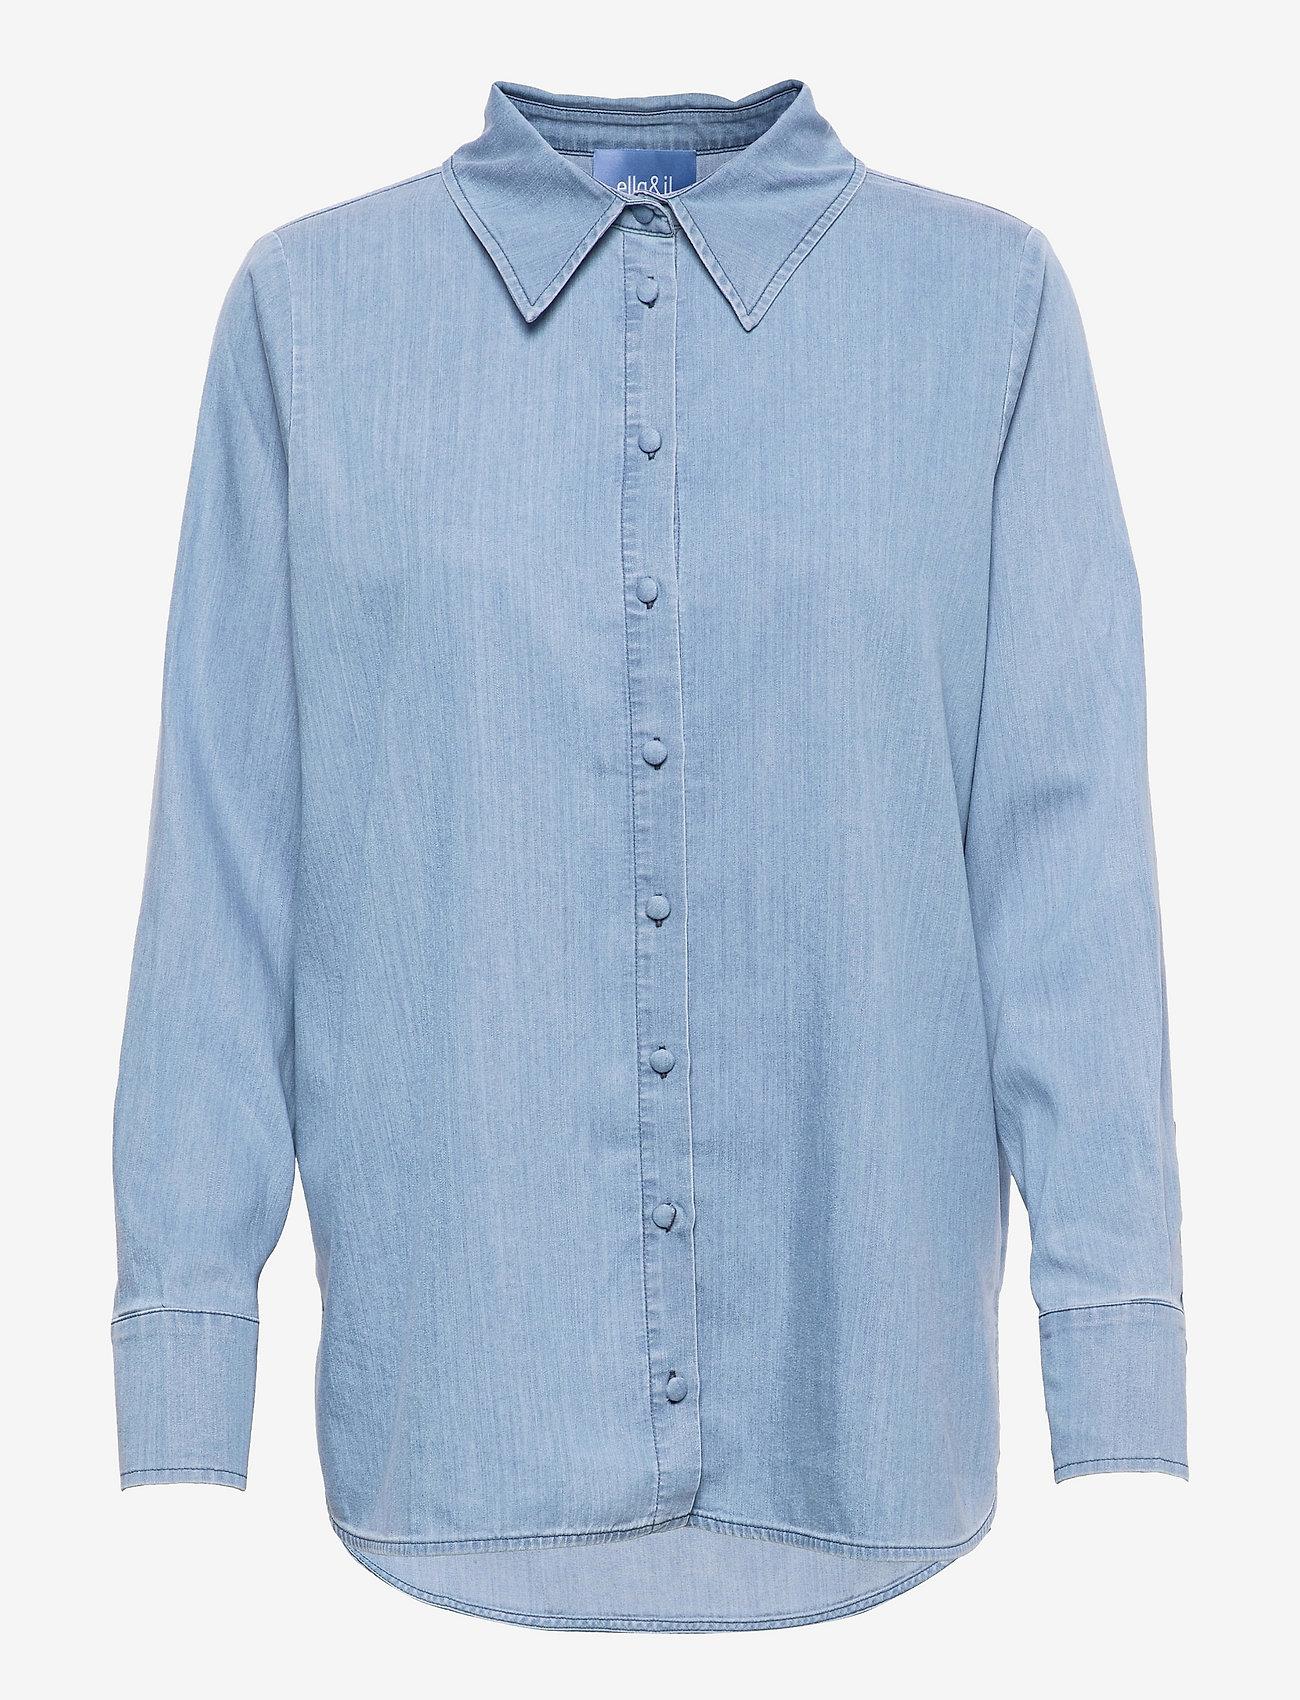 ella&il - Lissy denim shirt - chemises en jeans - blue denim - 0